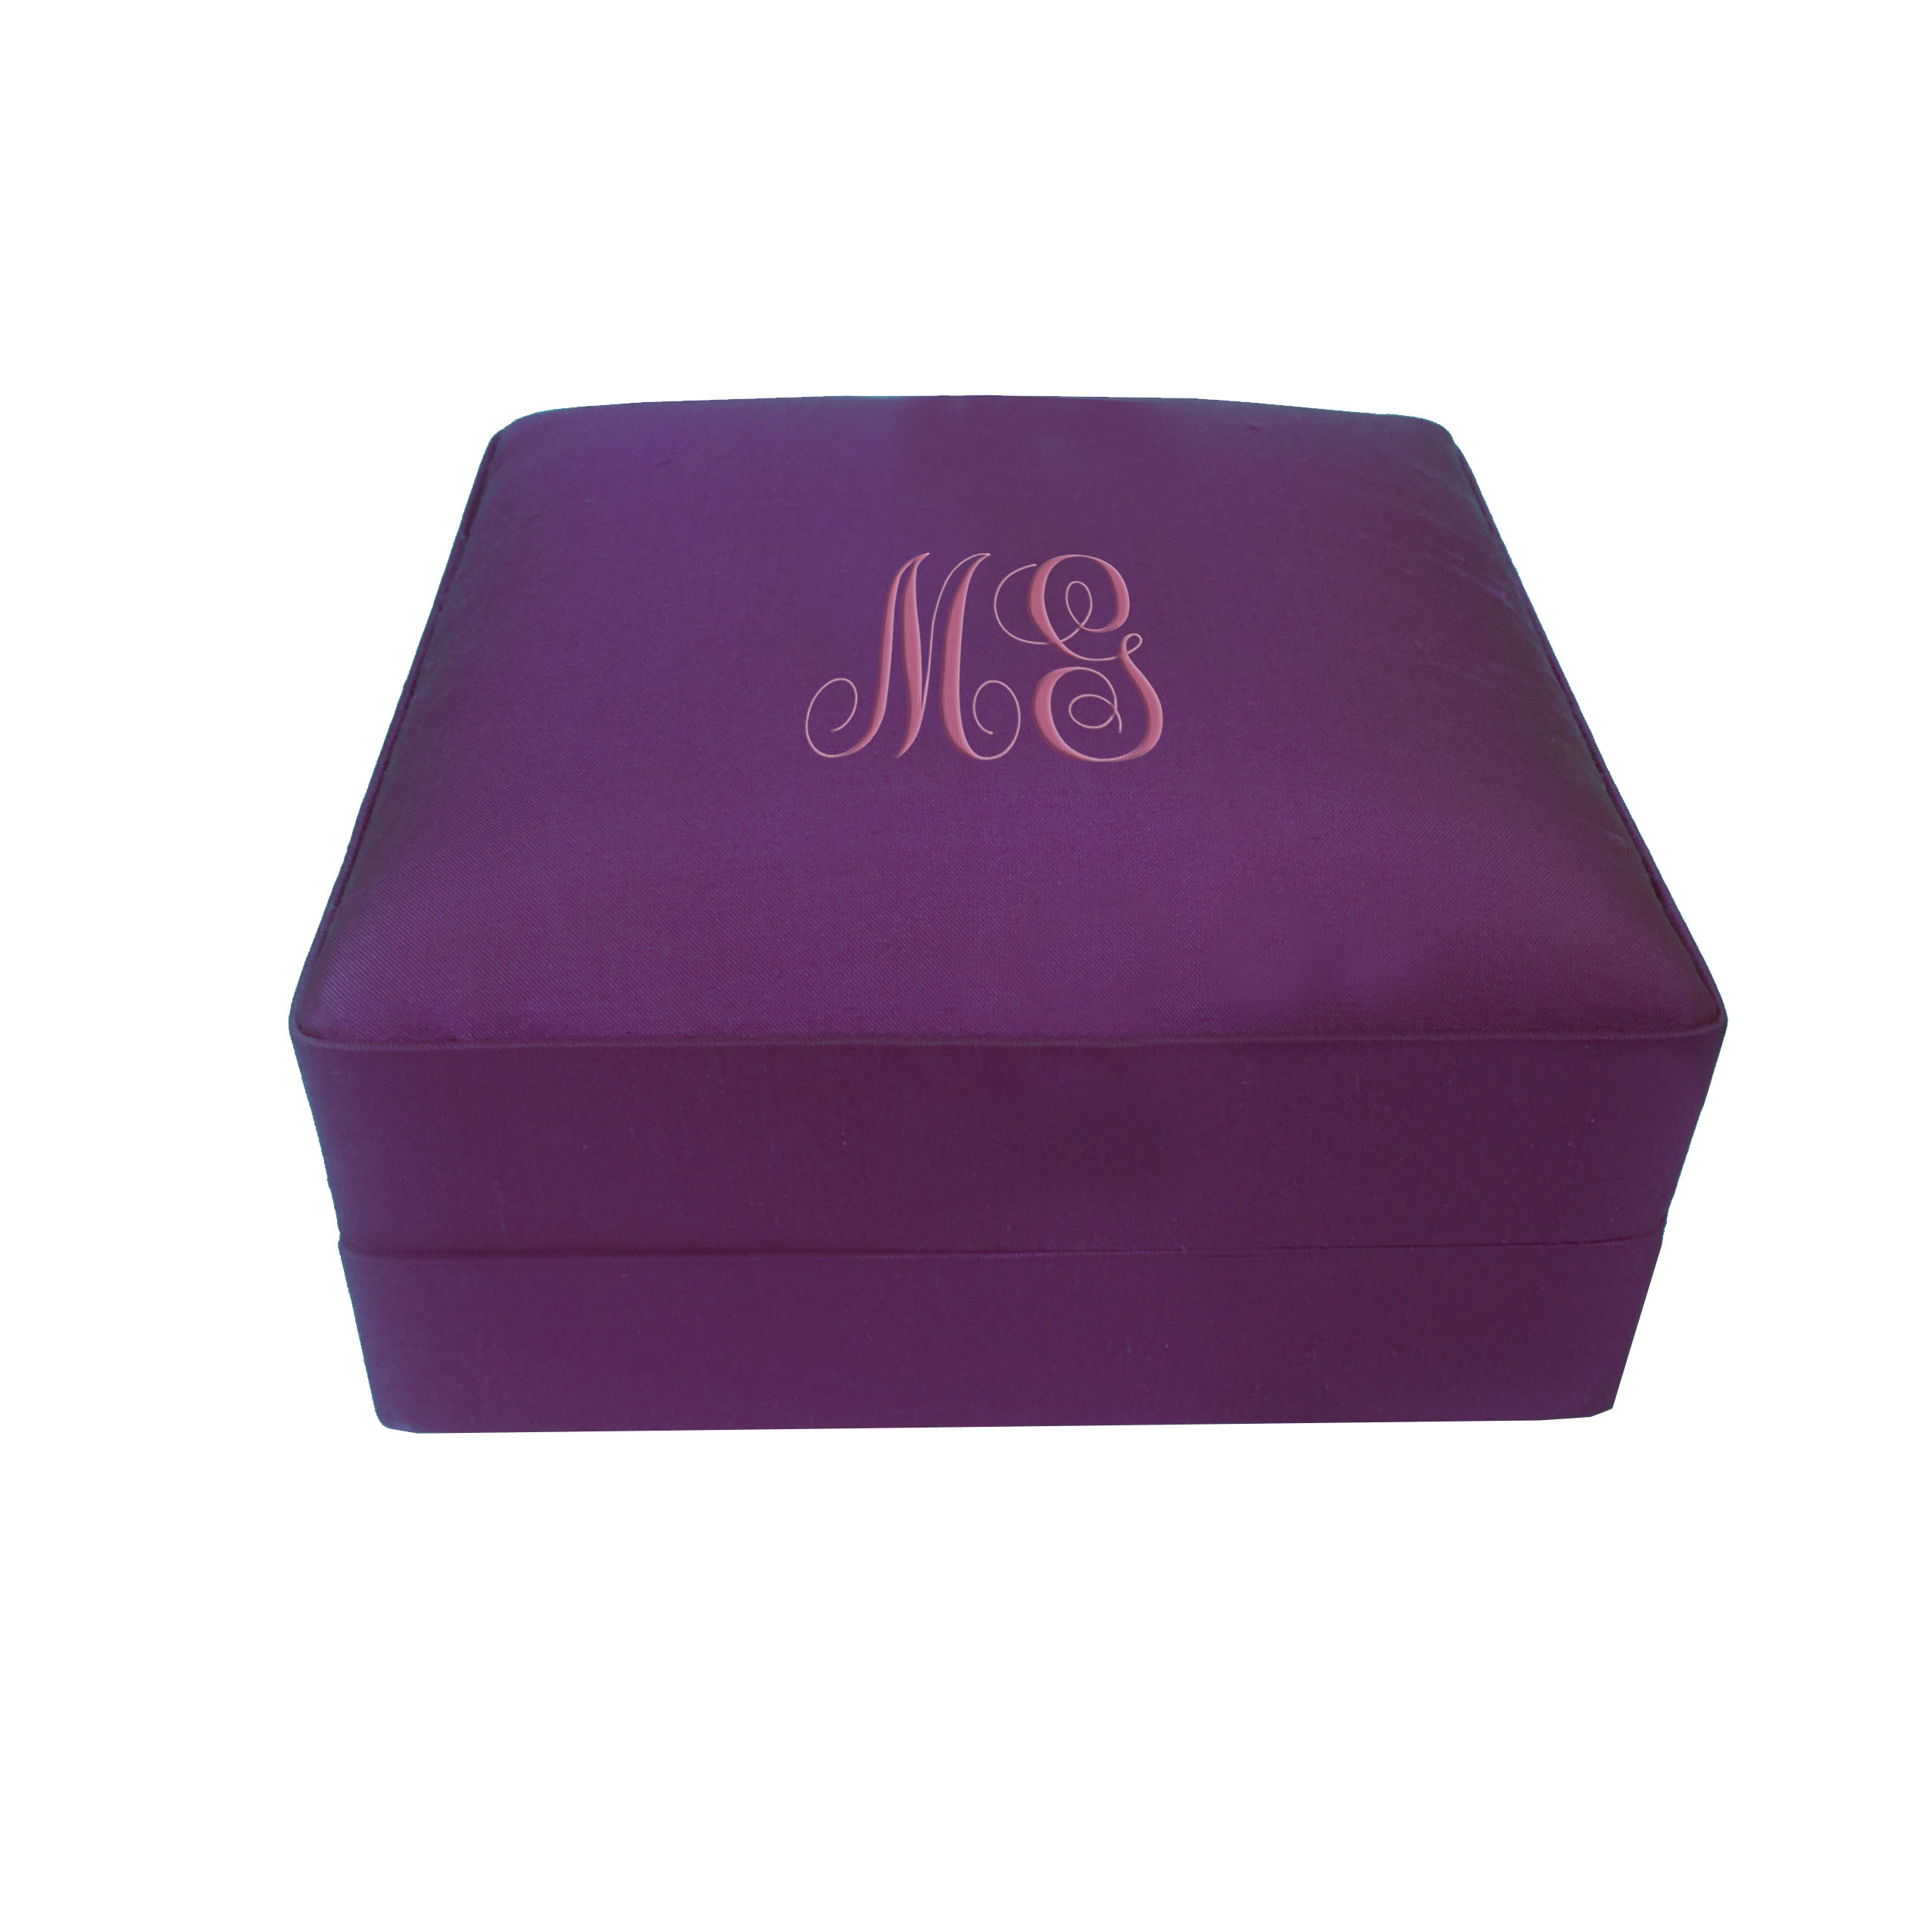 Fullsize Of Personalized Jewelry Box